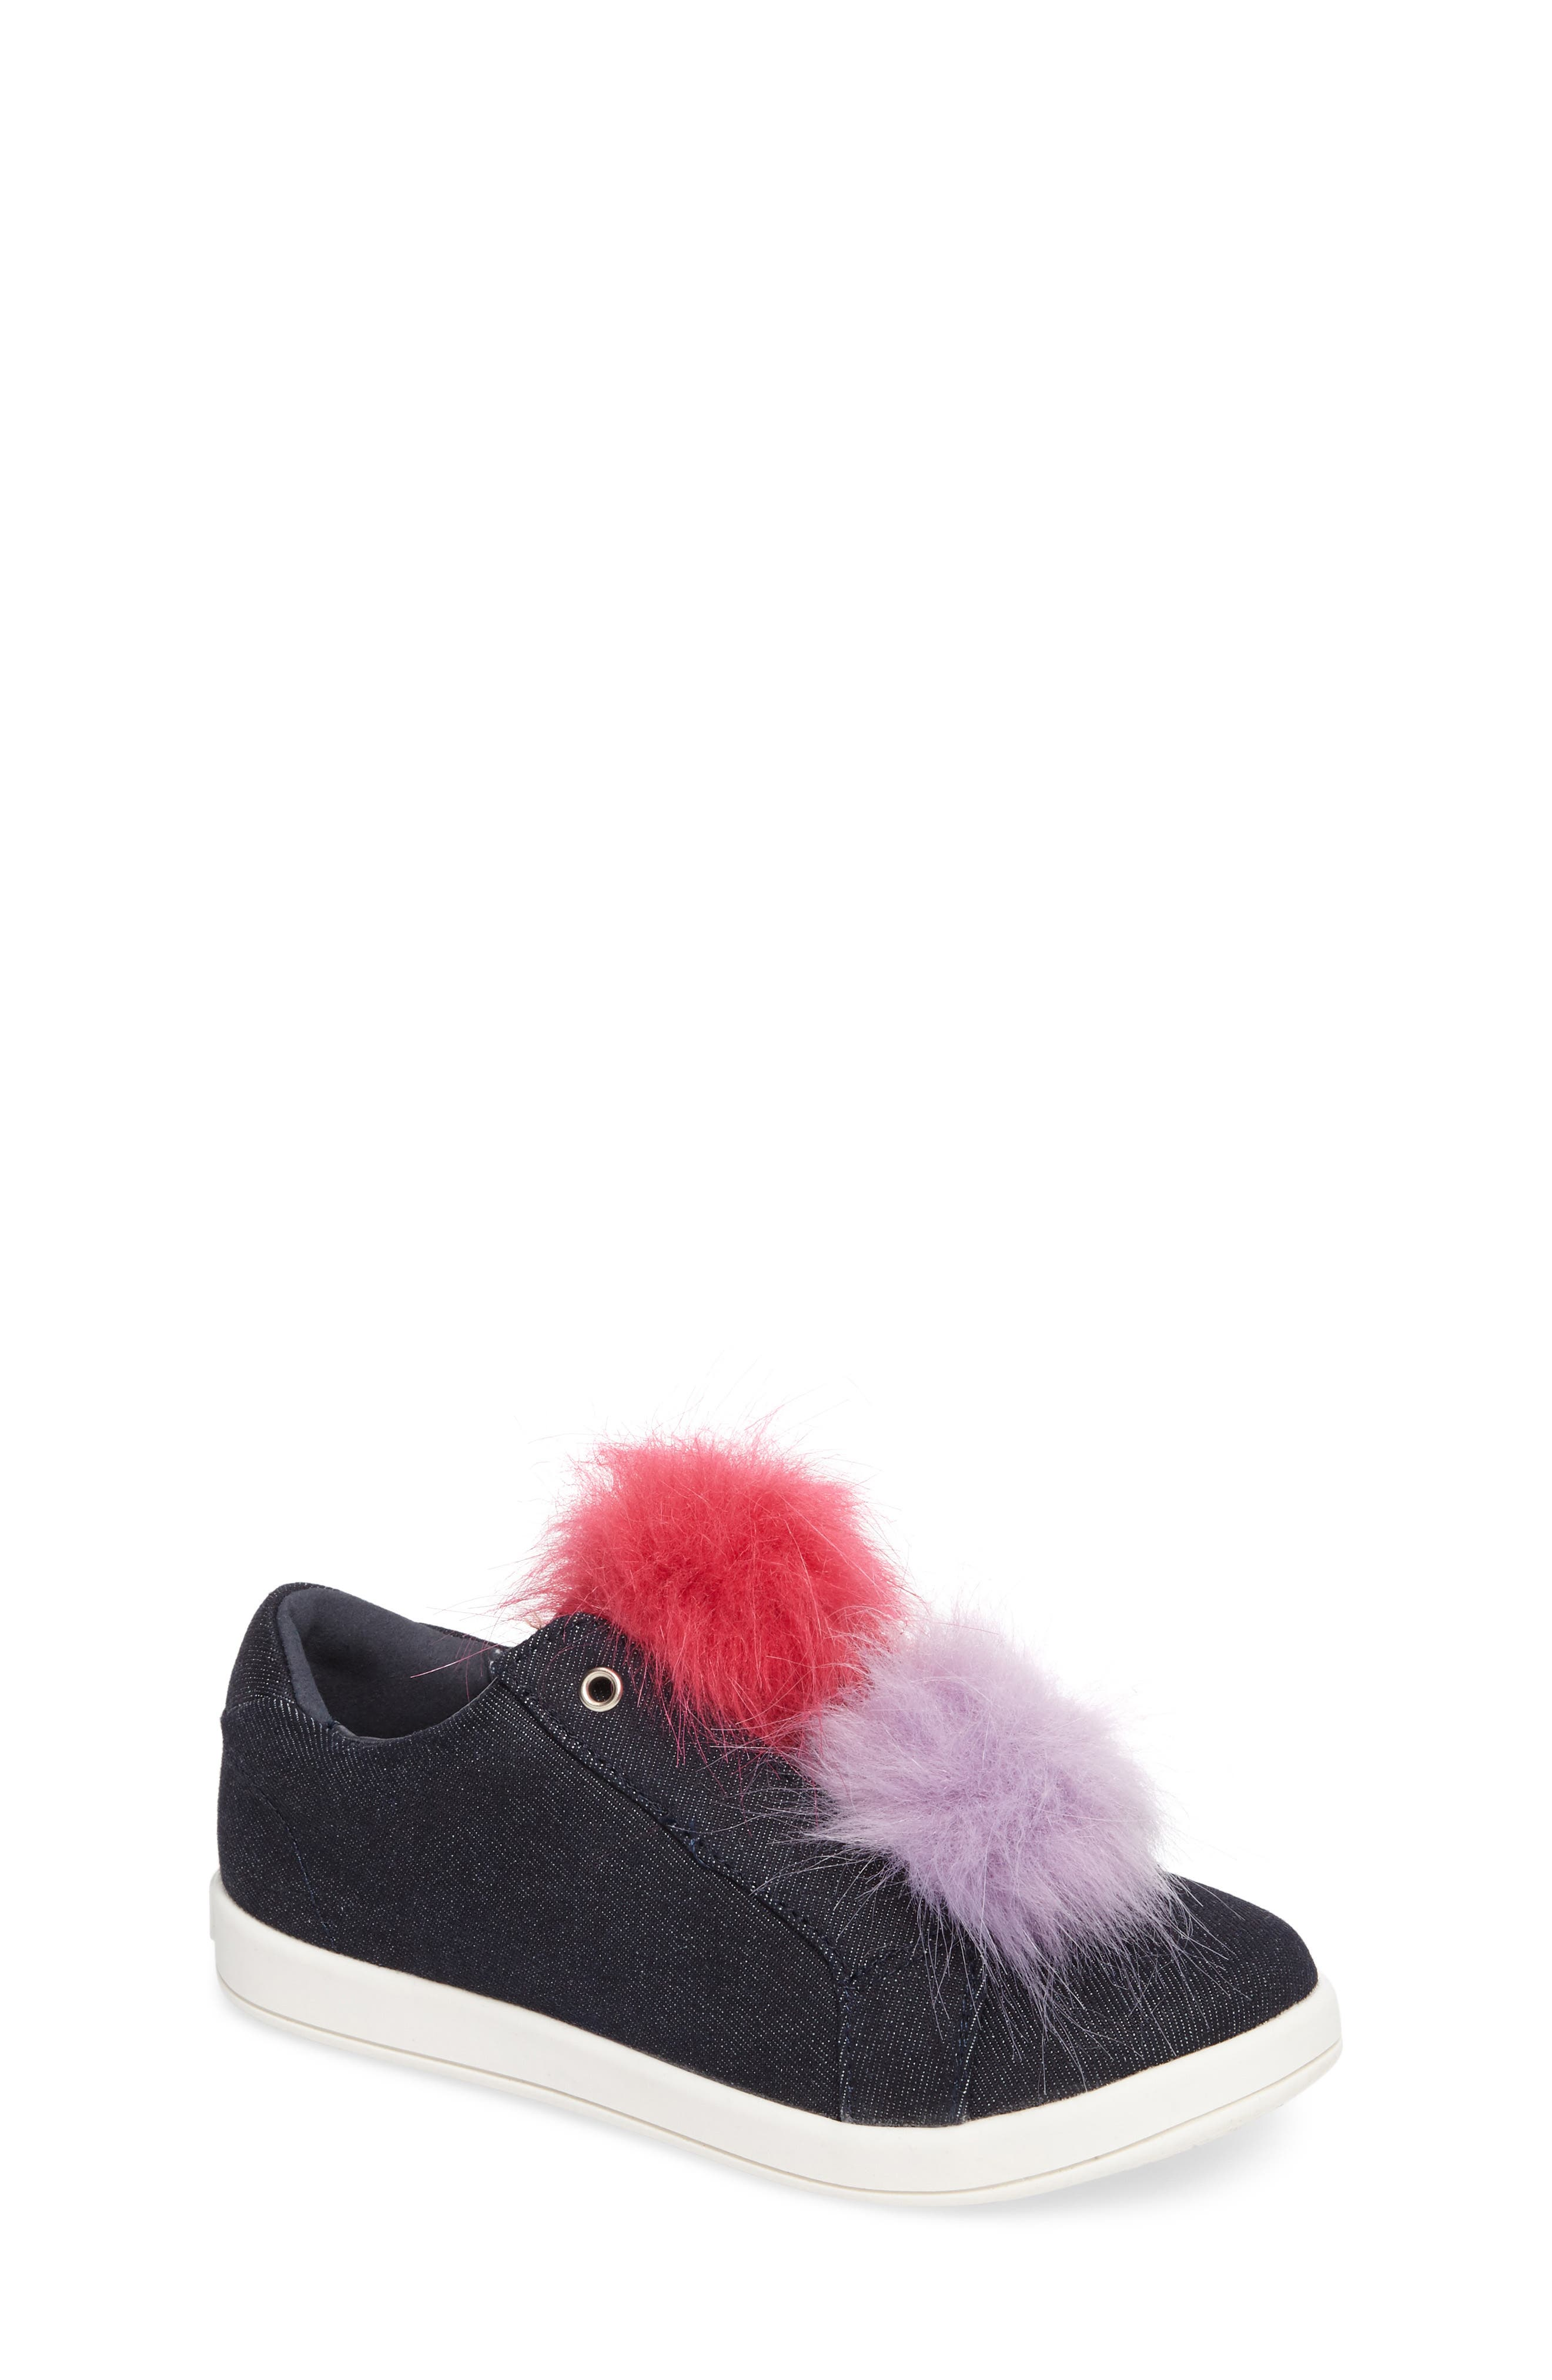 Cynthia Leya Faux Fur Pompom Slip-On Sneaker,                         Main,                         color, Denim